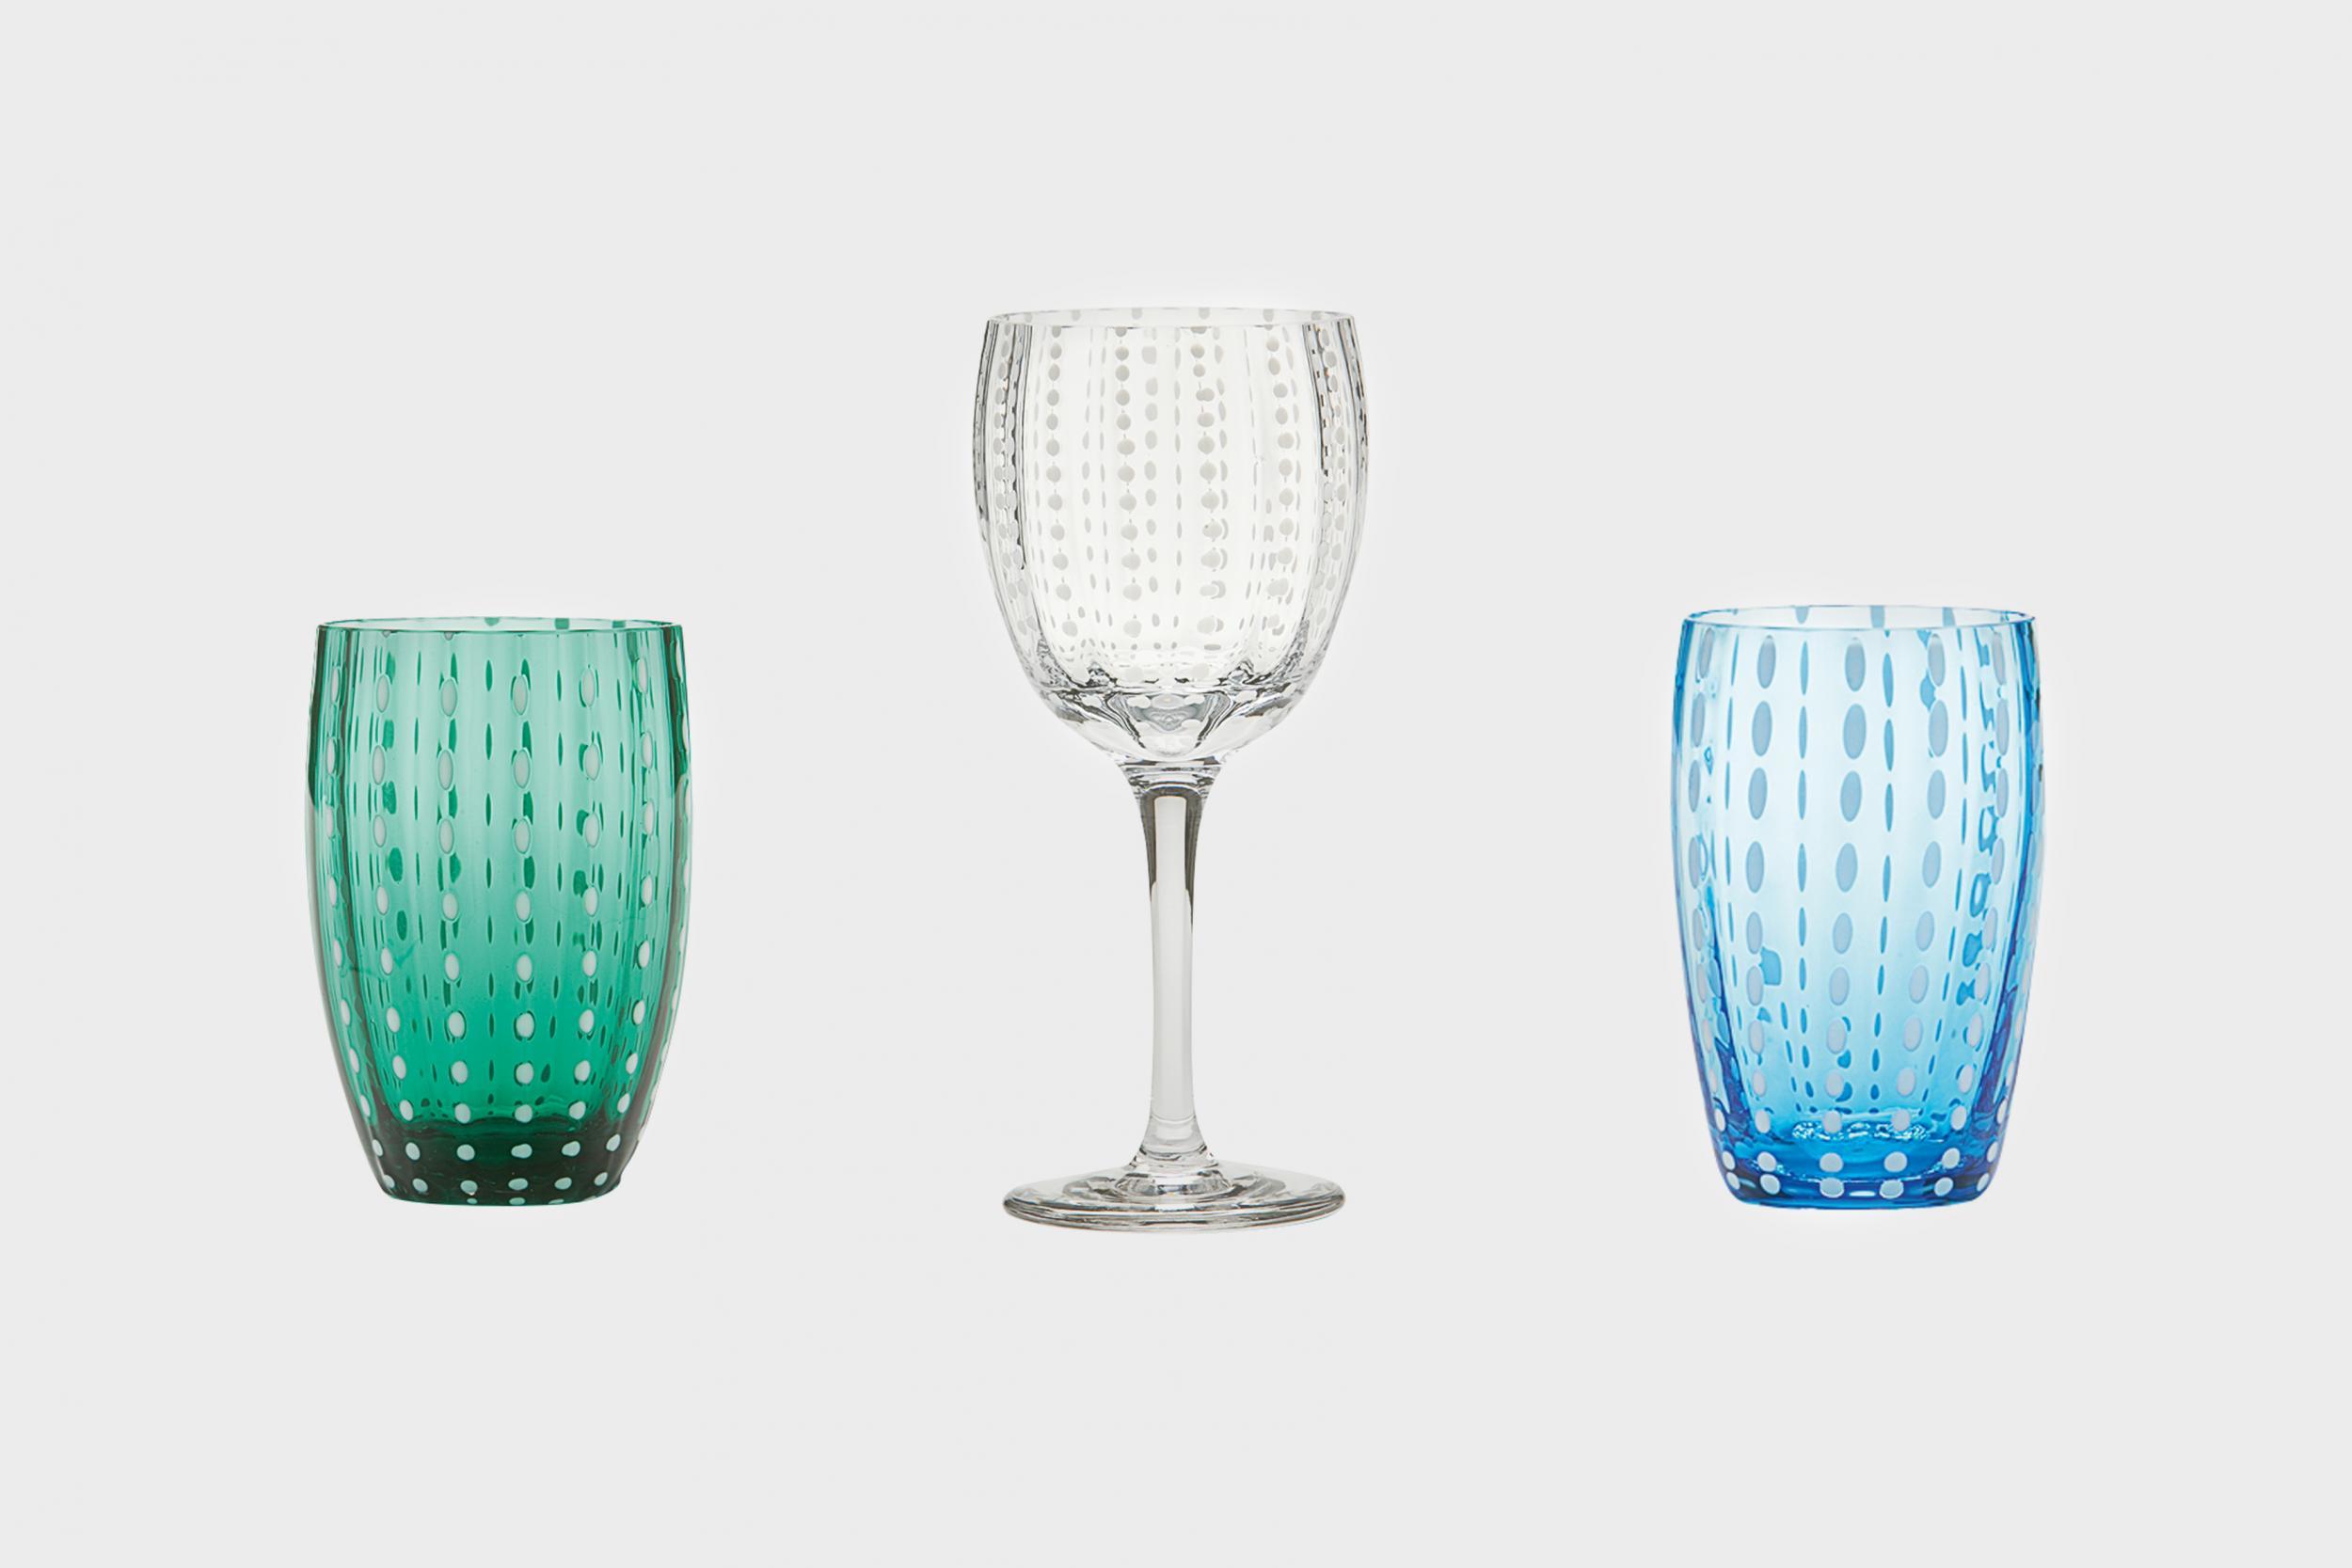 Perle wine glass - Image 1